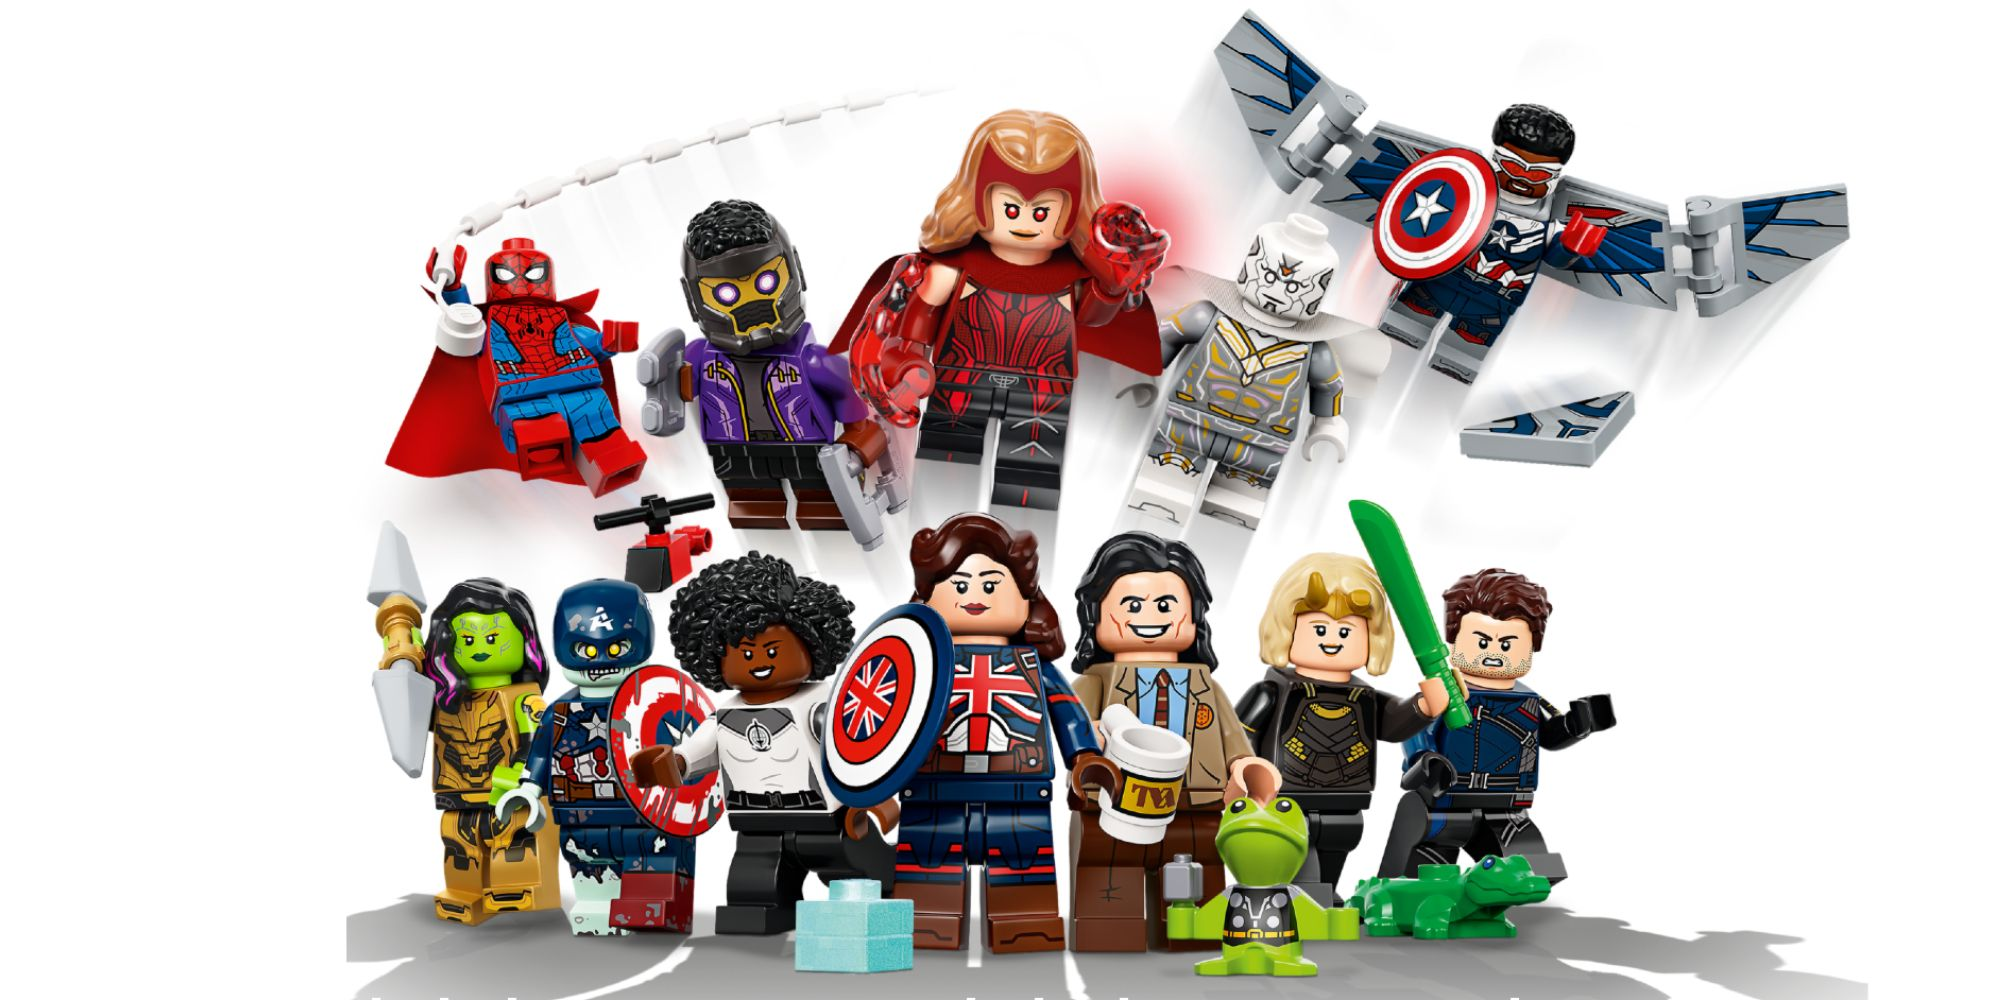 LEGO Reveals MCU Minifigure Collectibles With Throg & Alligator Loki